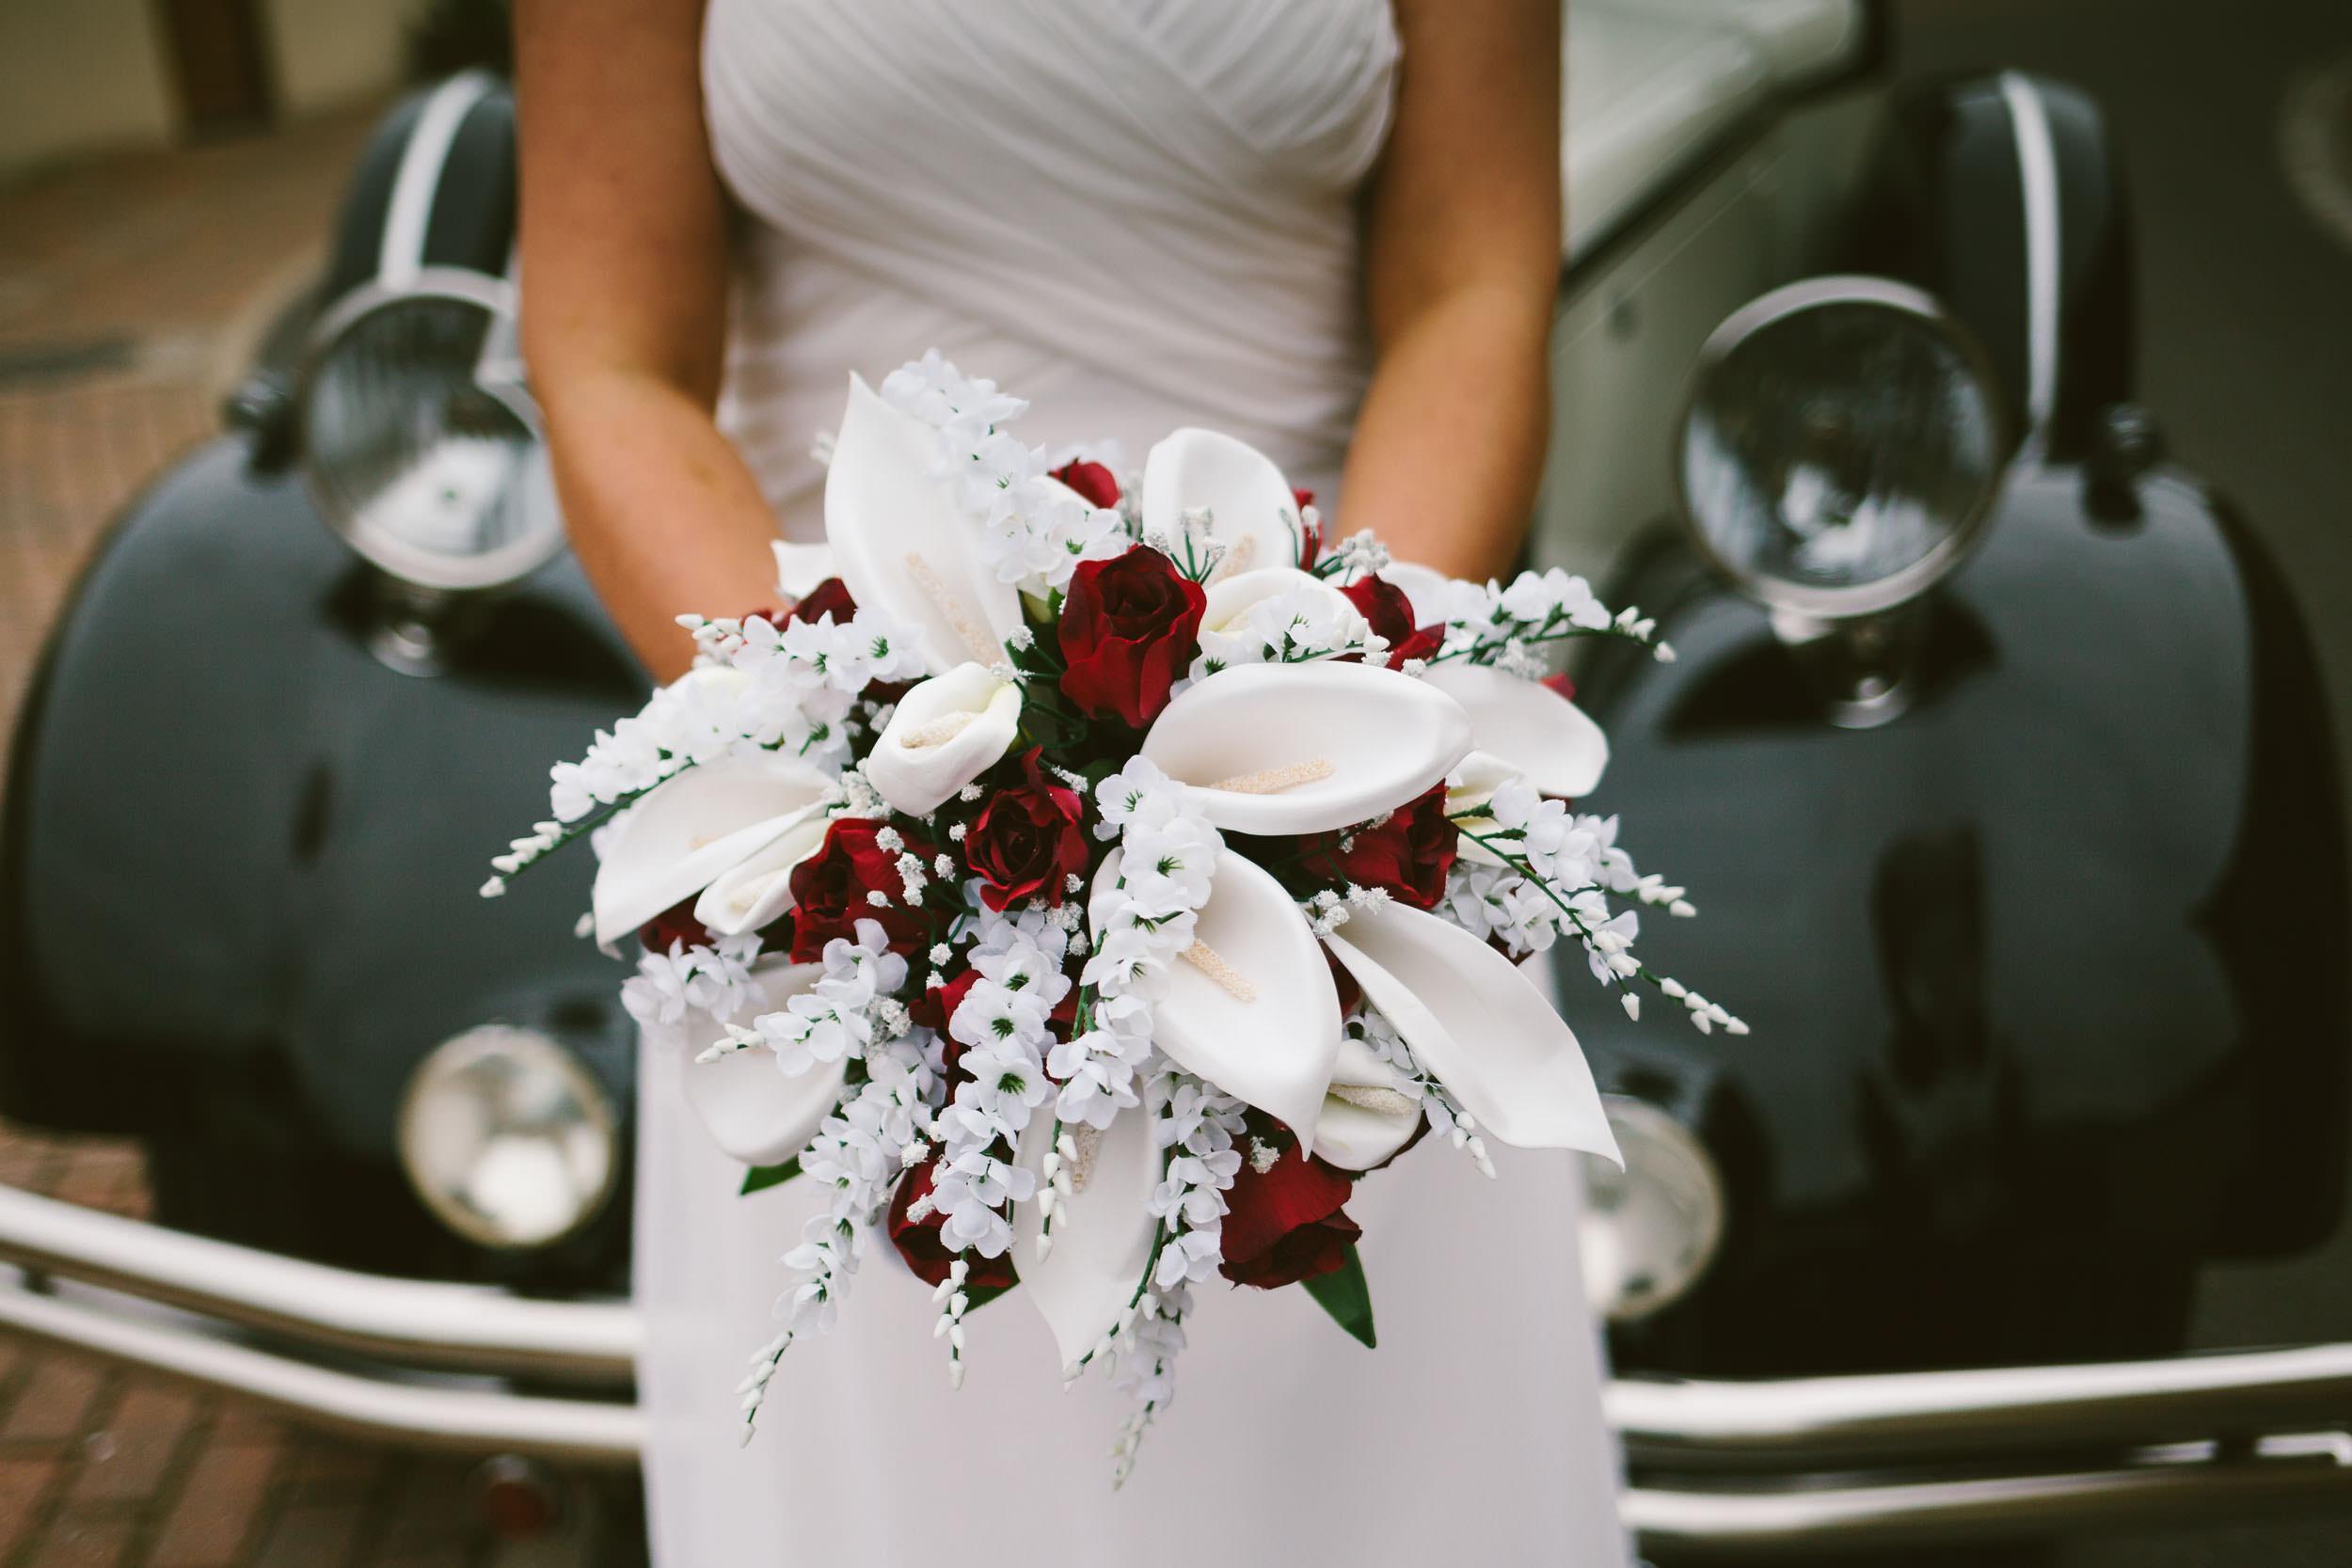 Close up of bride's wedding flowers